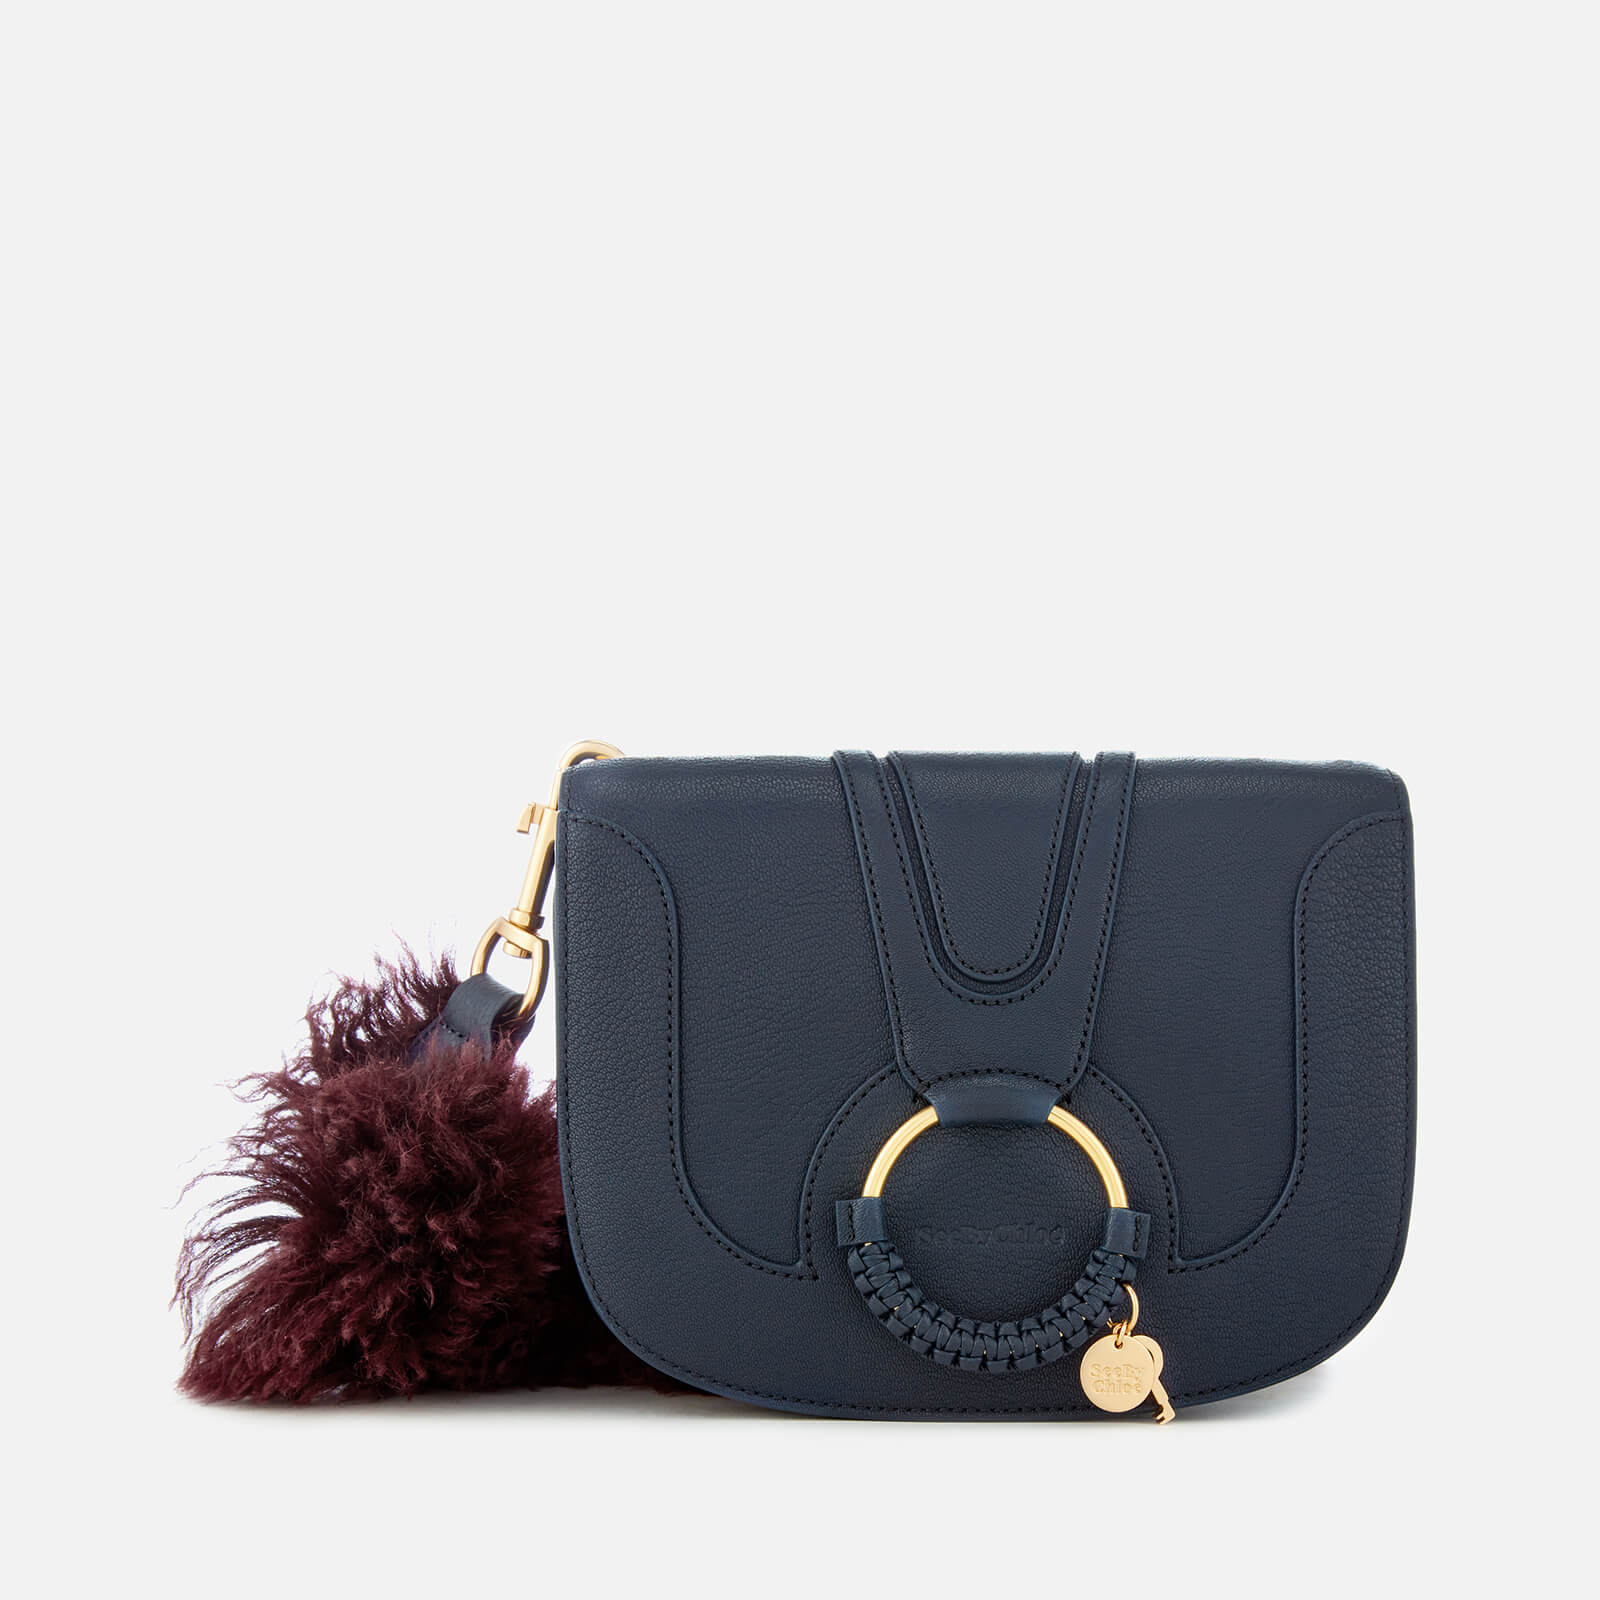 828e8fde30 See By Chloé Women s Hana Fur Strap Shoulder Bag - Ultramarine - Free UK  Delivery over £50